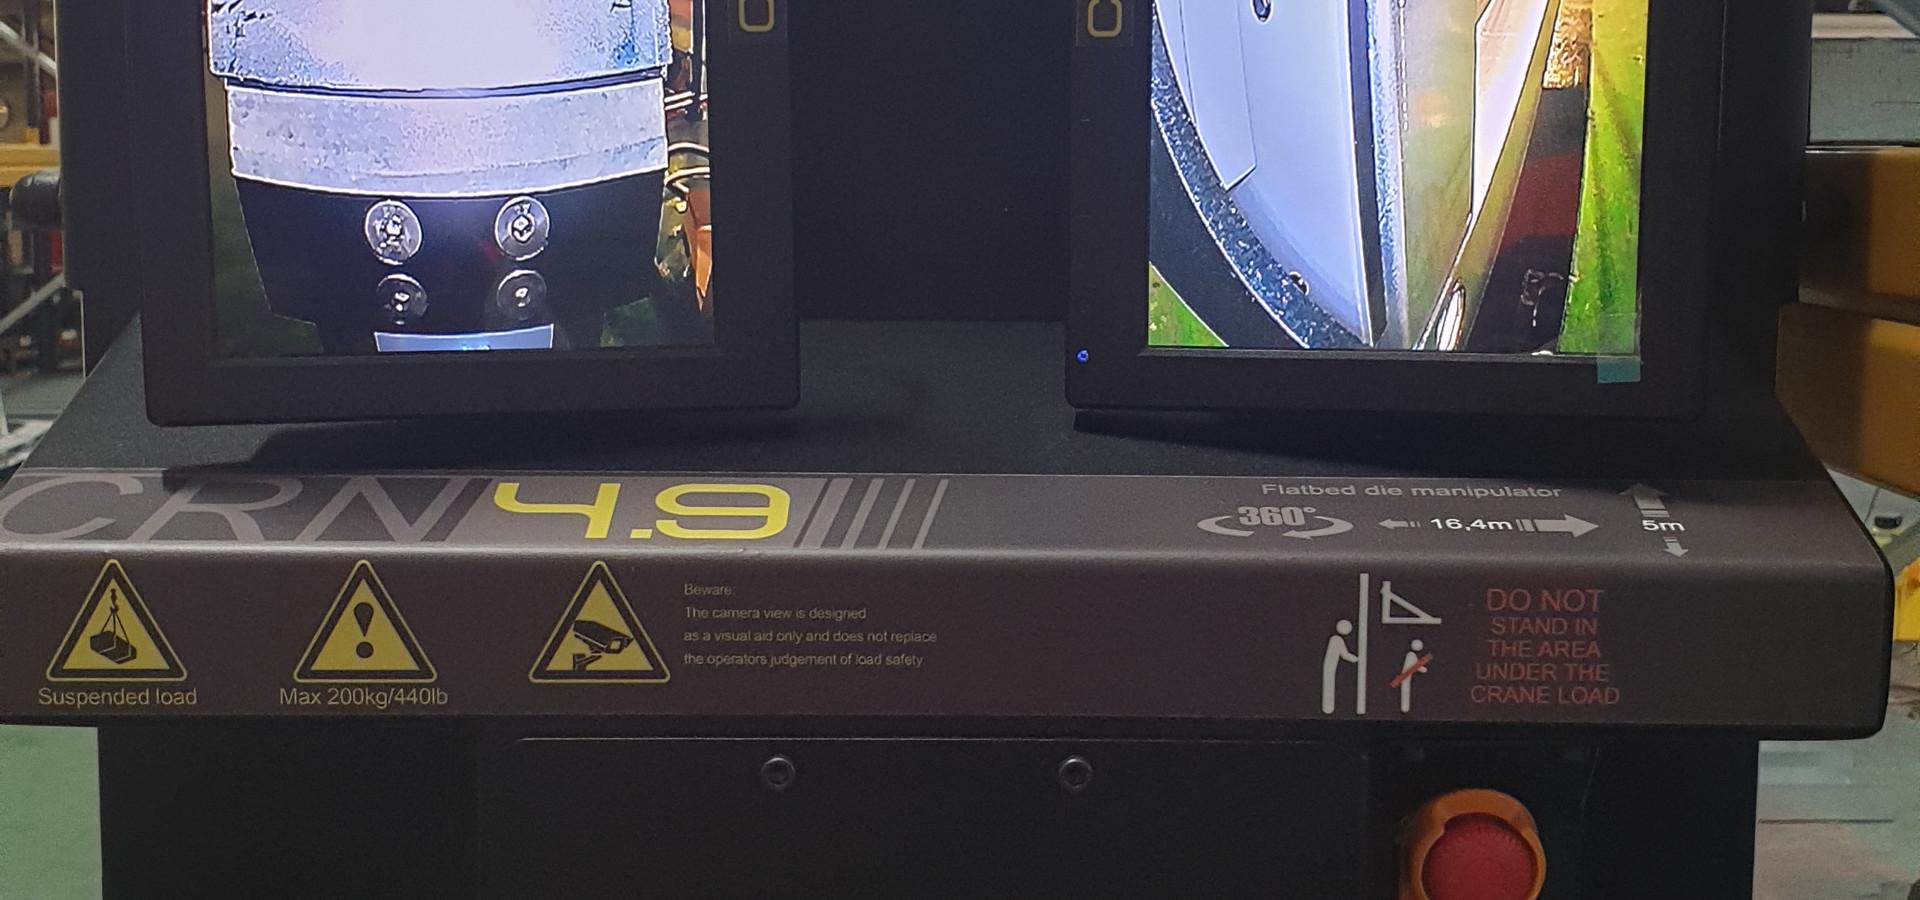 HD Monitors & Cameras